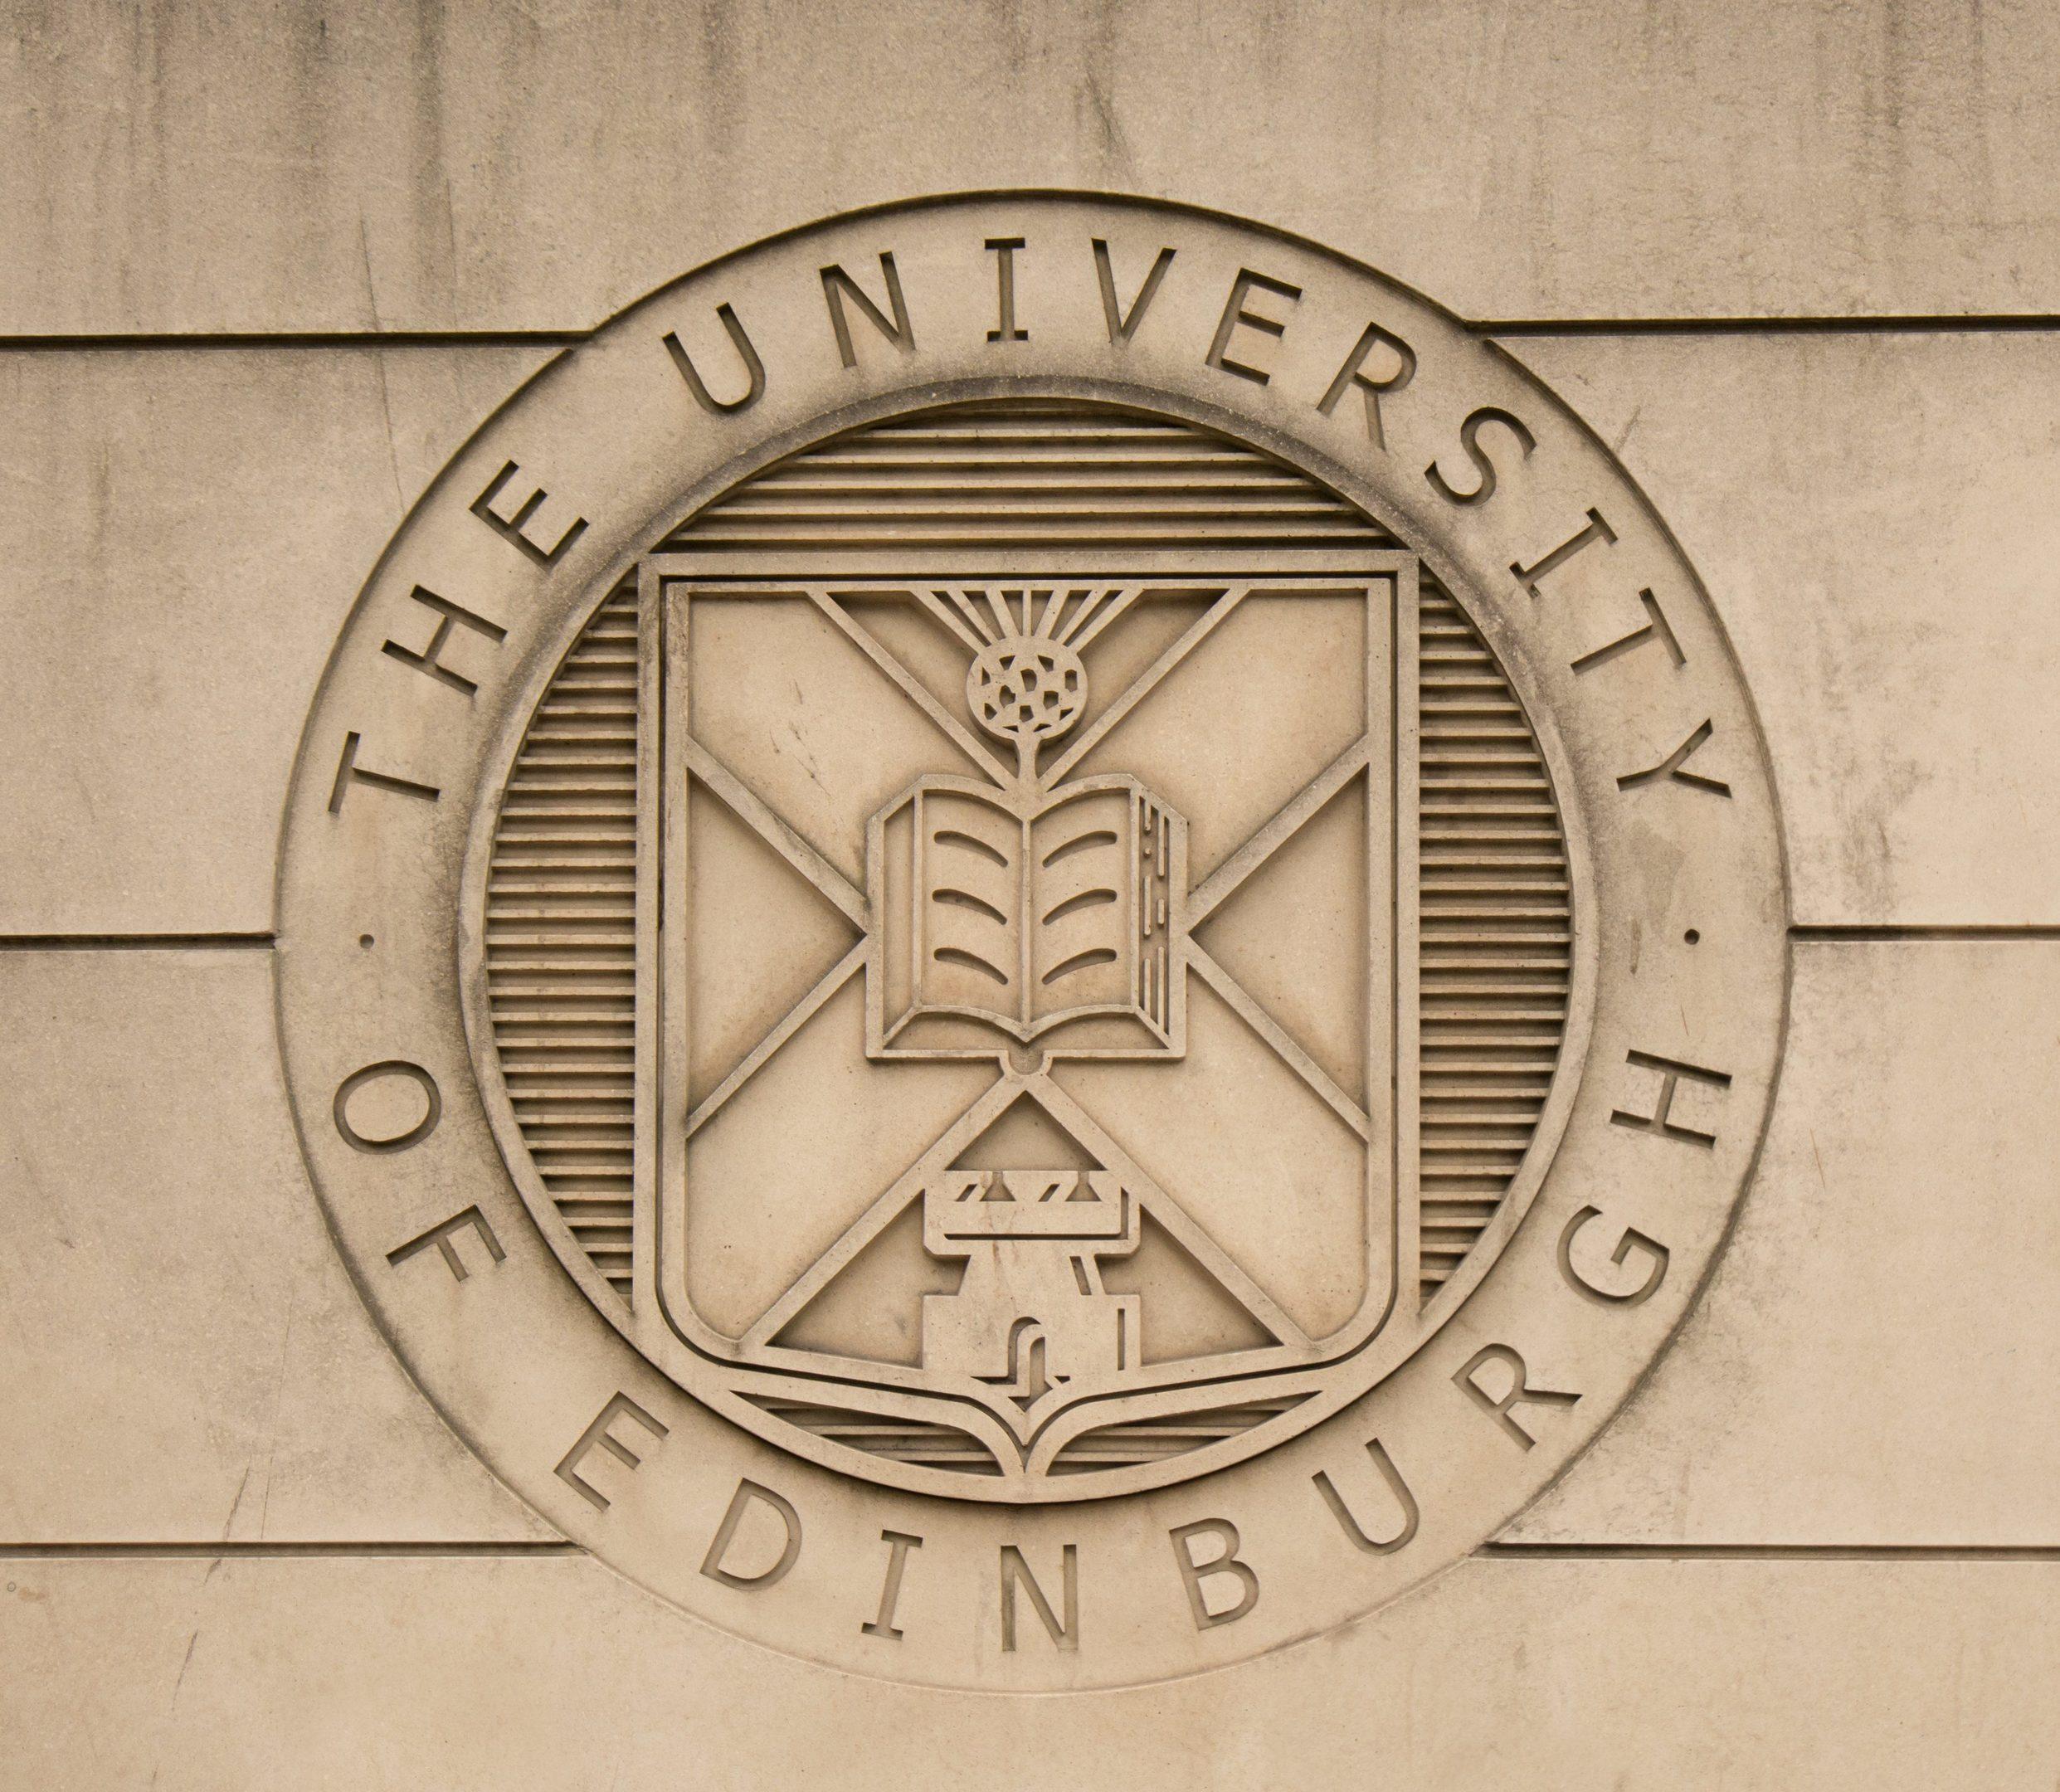 Edinburgh University (iStock)